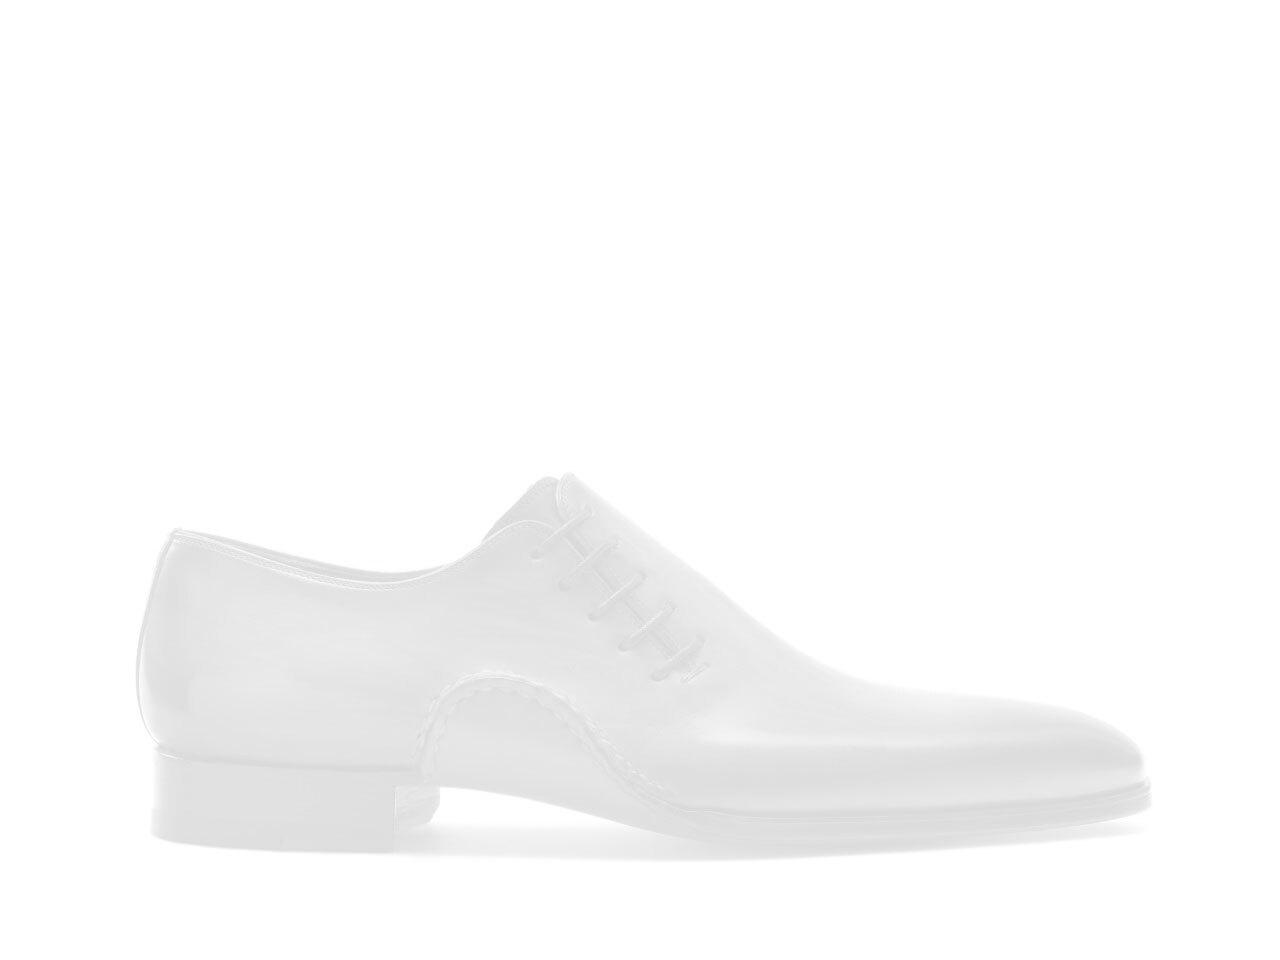 Pair of the Magnanni Reina Grey Men's Sneakers